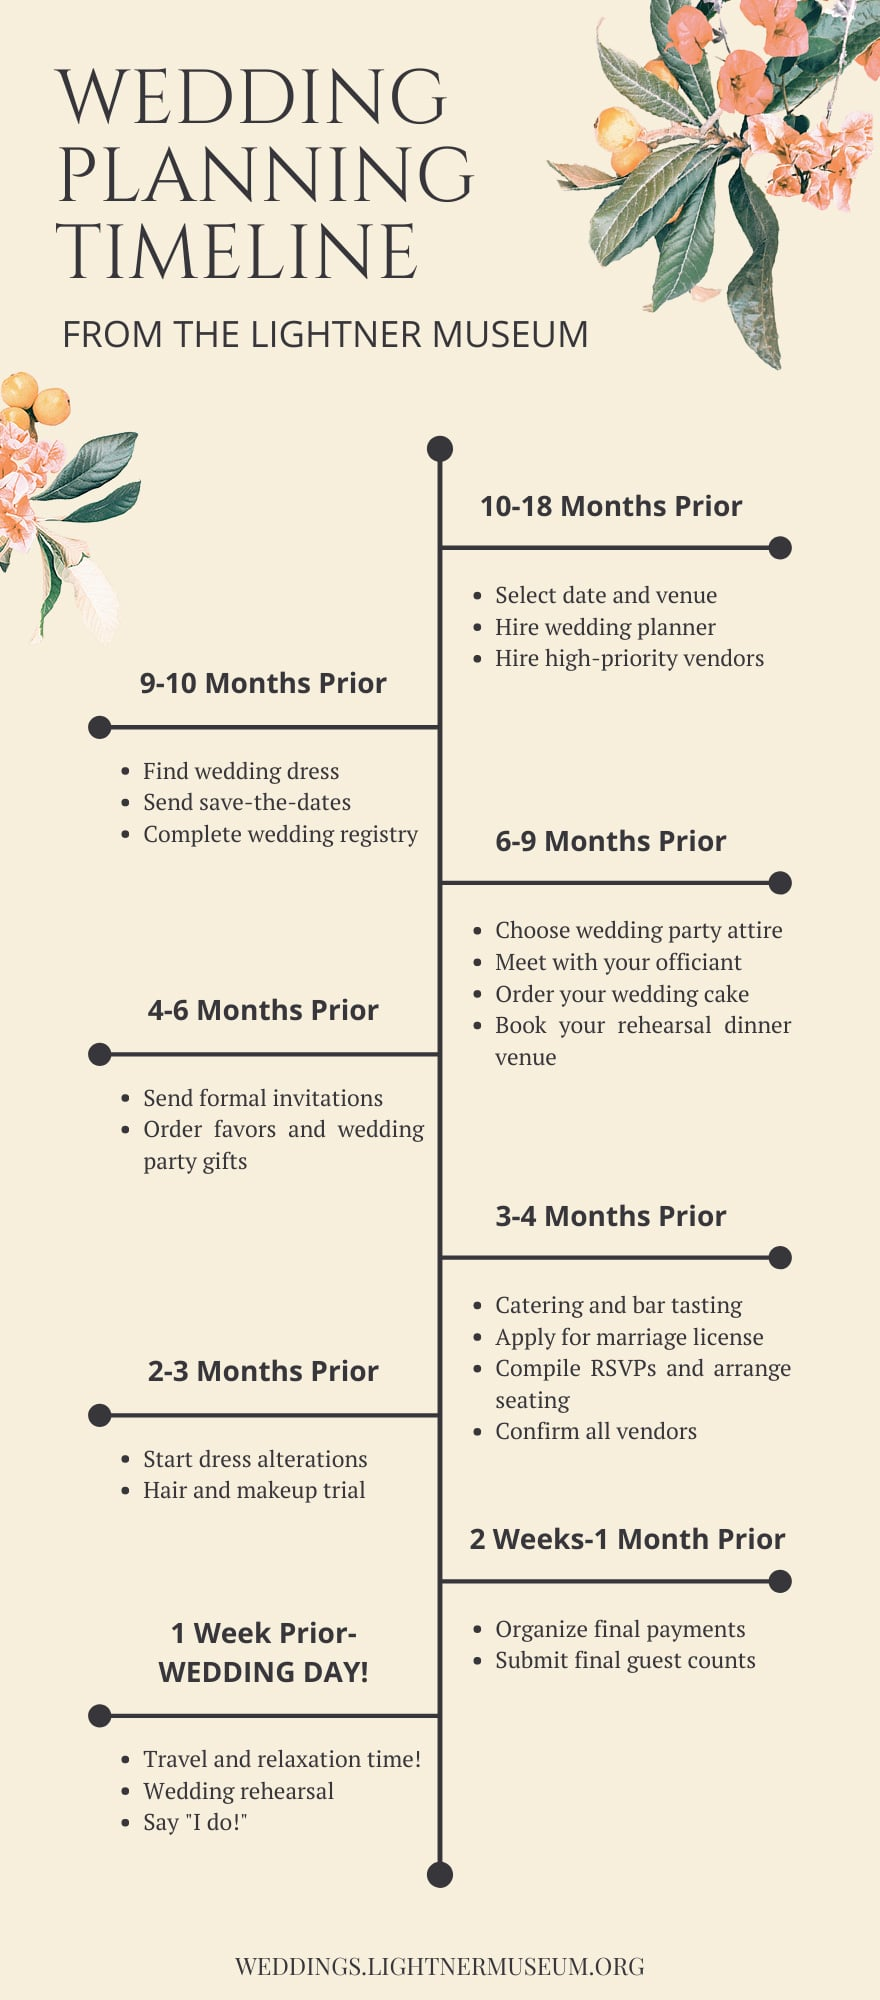 Wedding Planning Timeline 2021 from the Lightner Museum